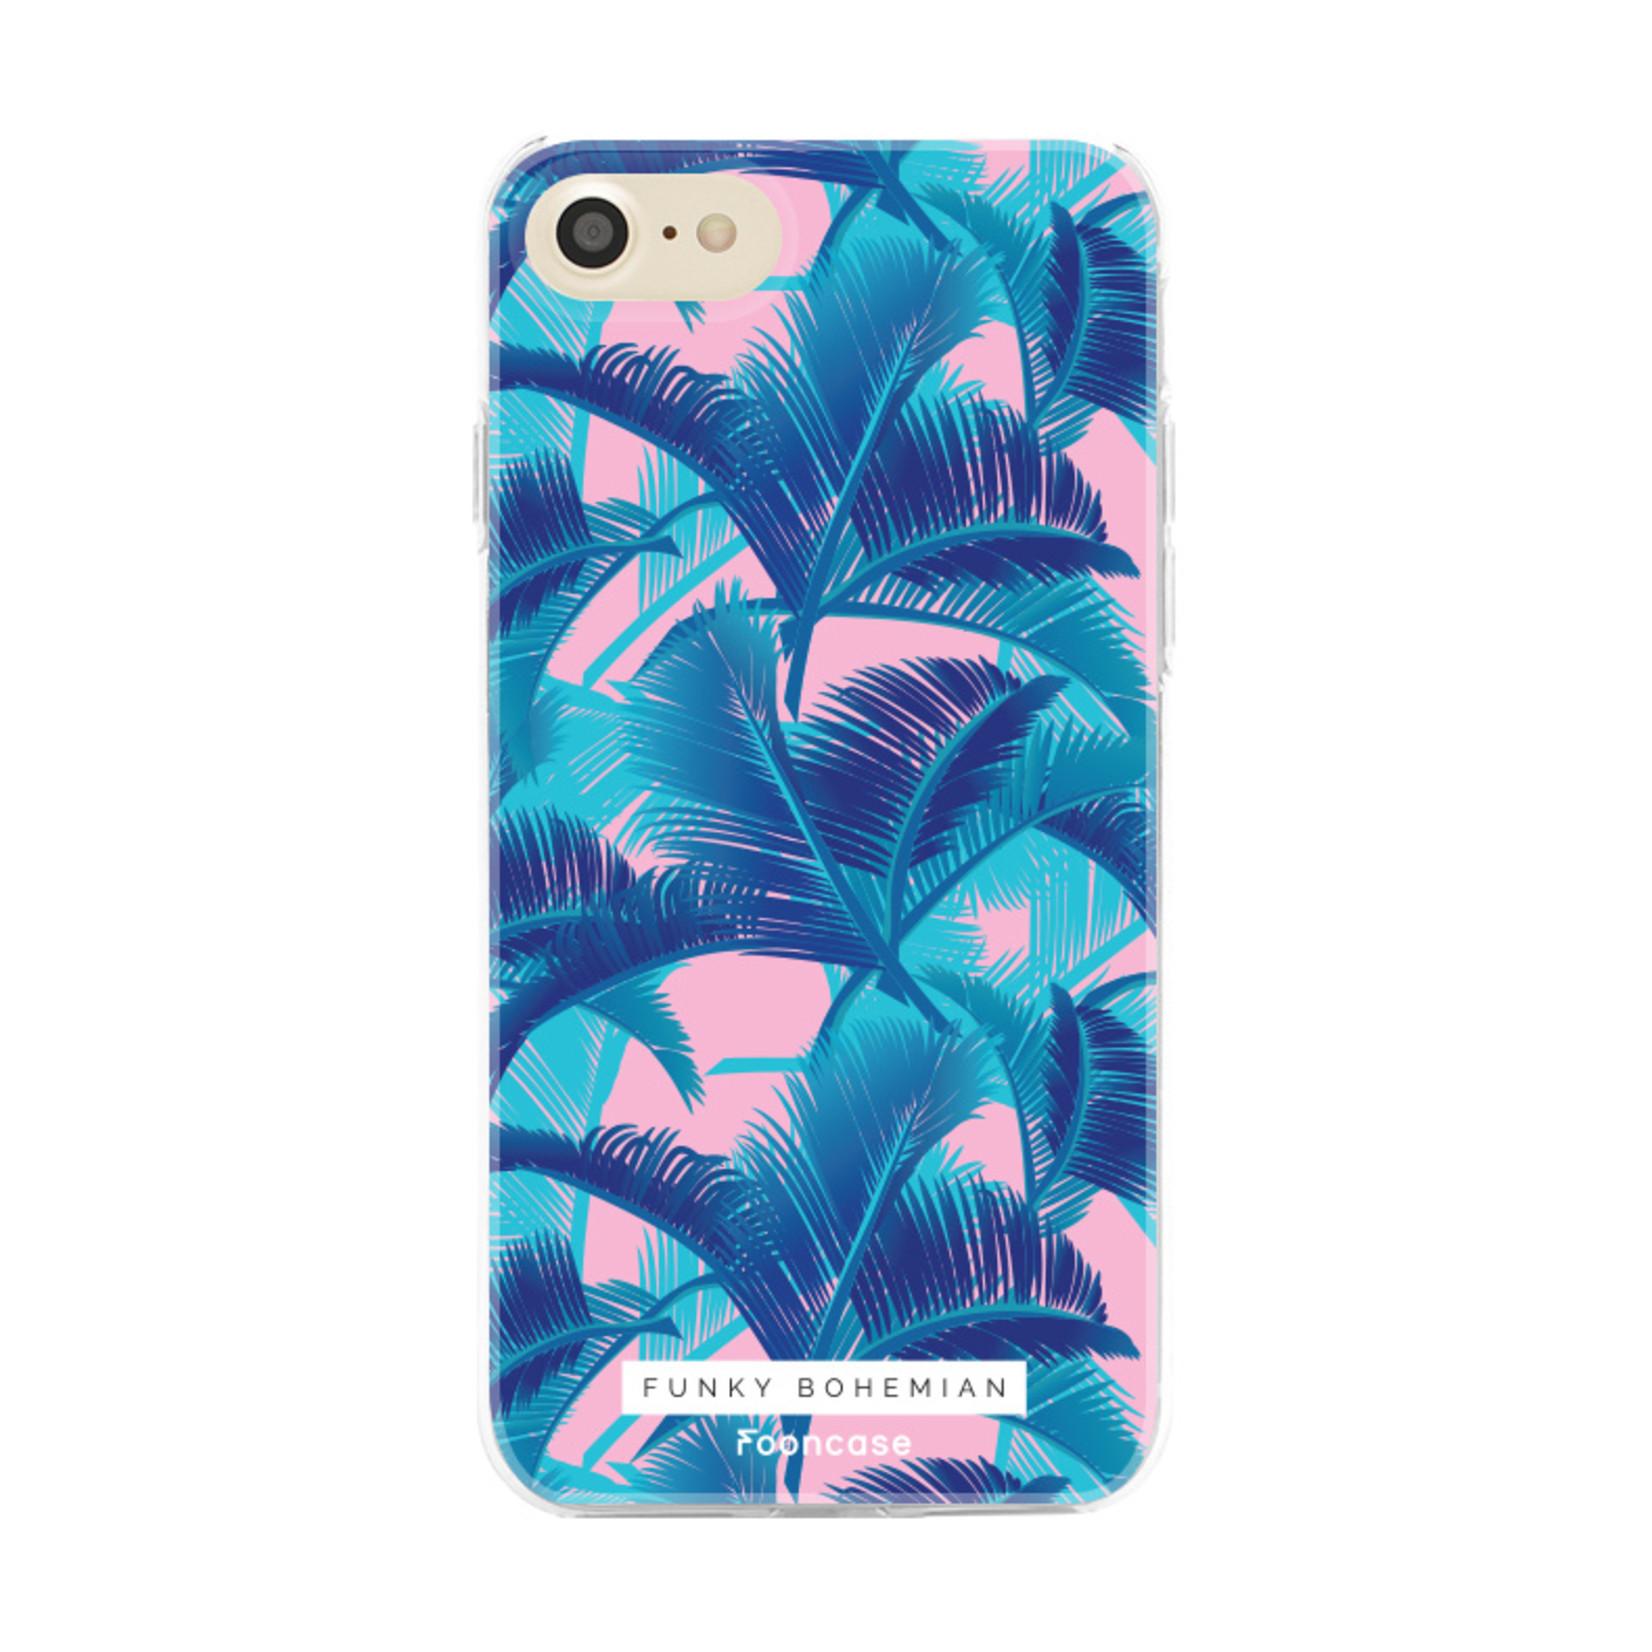 FOONCASE iPhone 8 hoesje TPU Soft Case - Back Cover - Funky Bohemian / Blauw Roze Bladeren